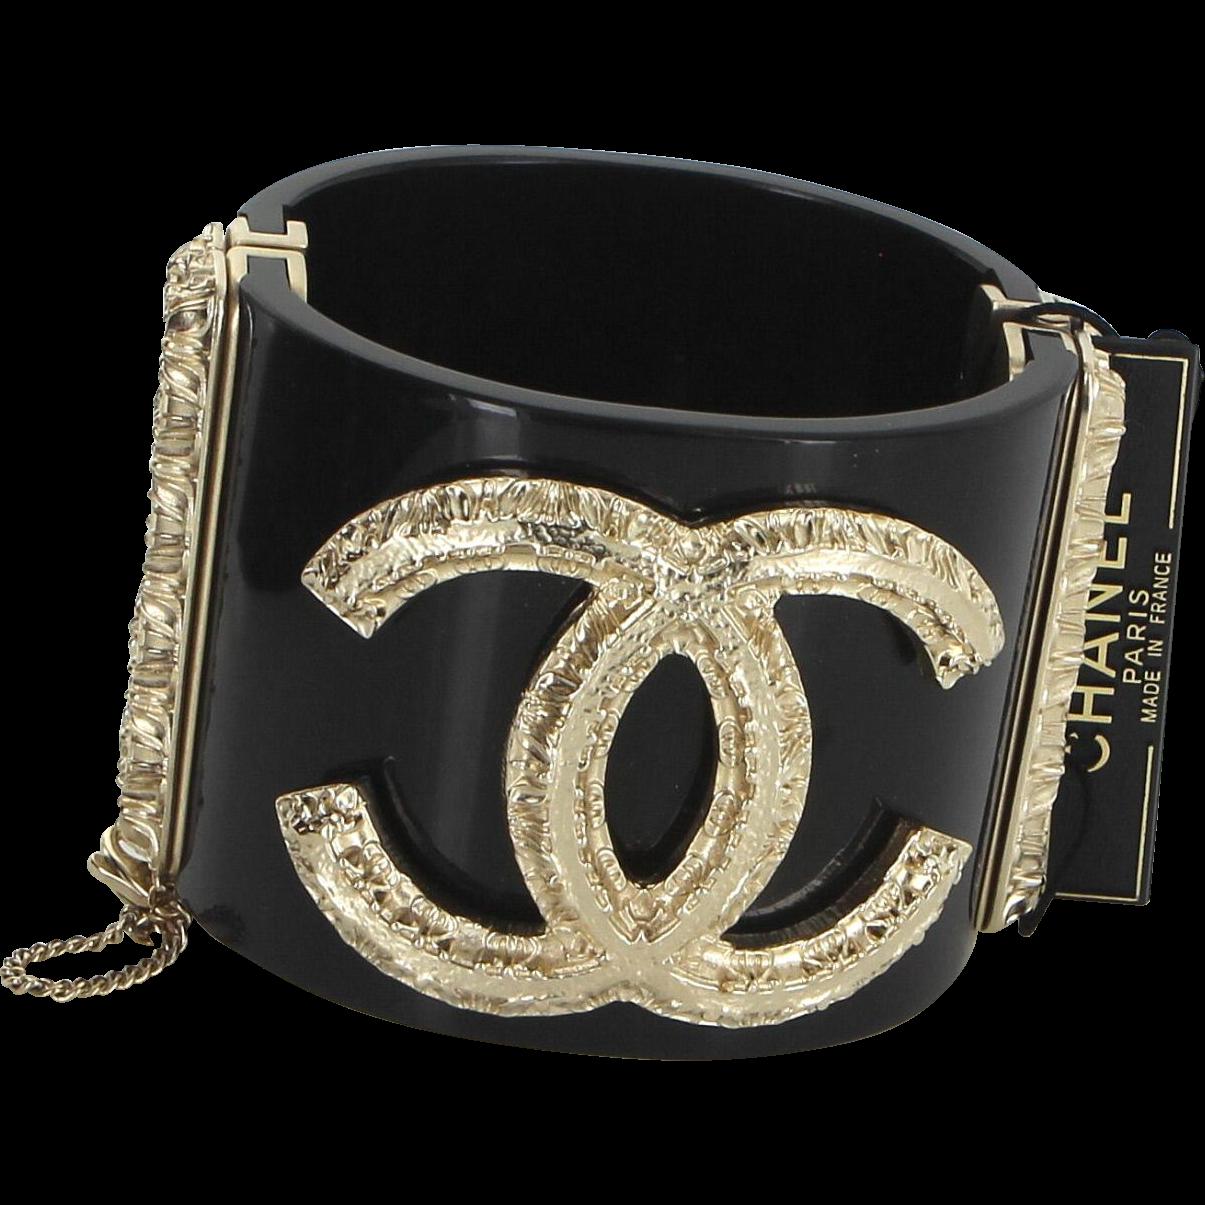 Chanel Black Double CC Logo Bangle Bracelet A2011 Designer Estate Jewelry Cuff